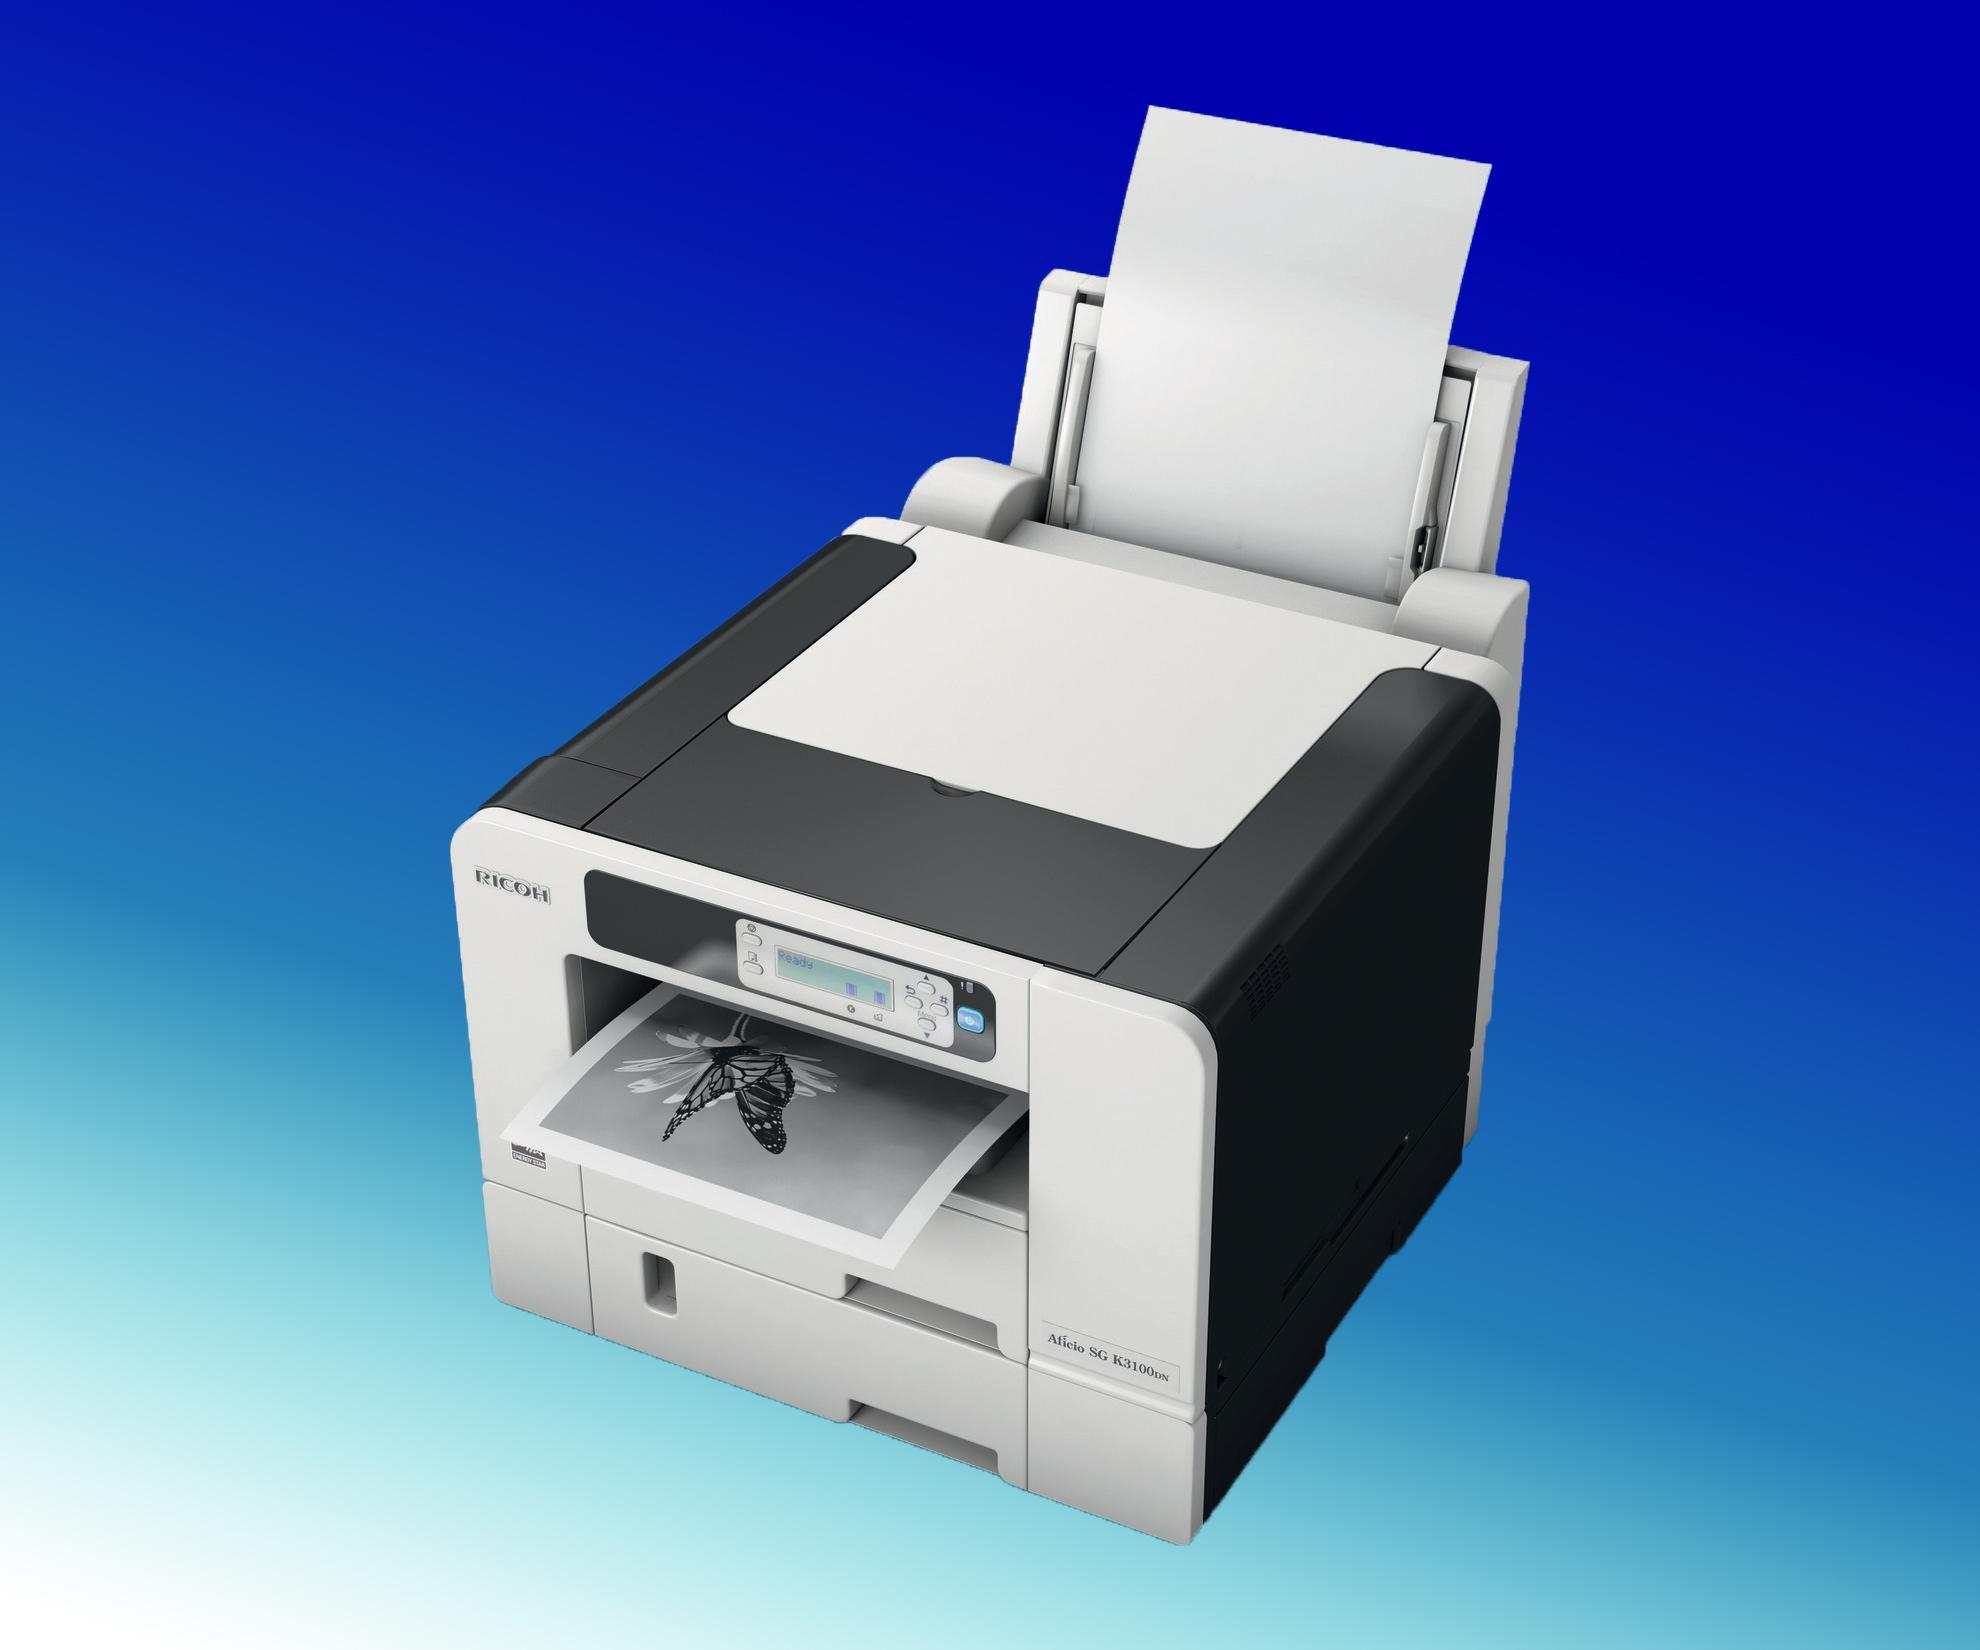 Drivers Update: Ricoh Aficio SG K3100DN Printer PCL 5c